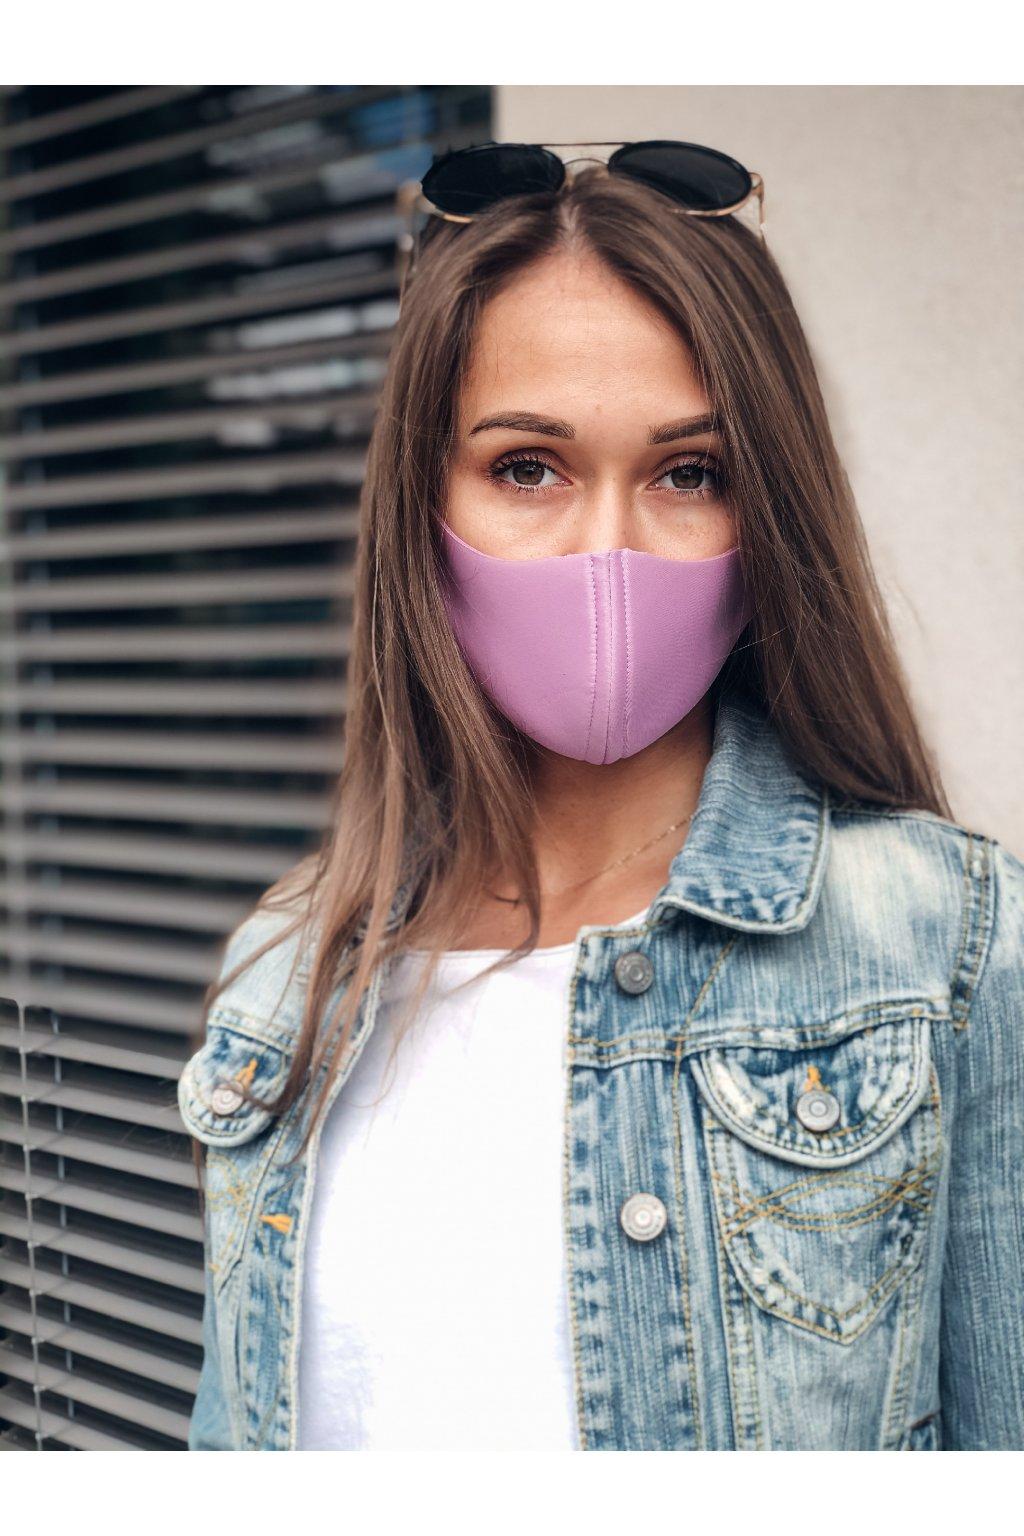 stylova rouska purple eshopat cz 1